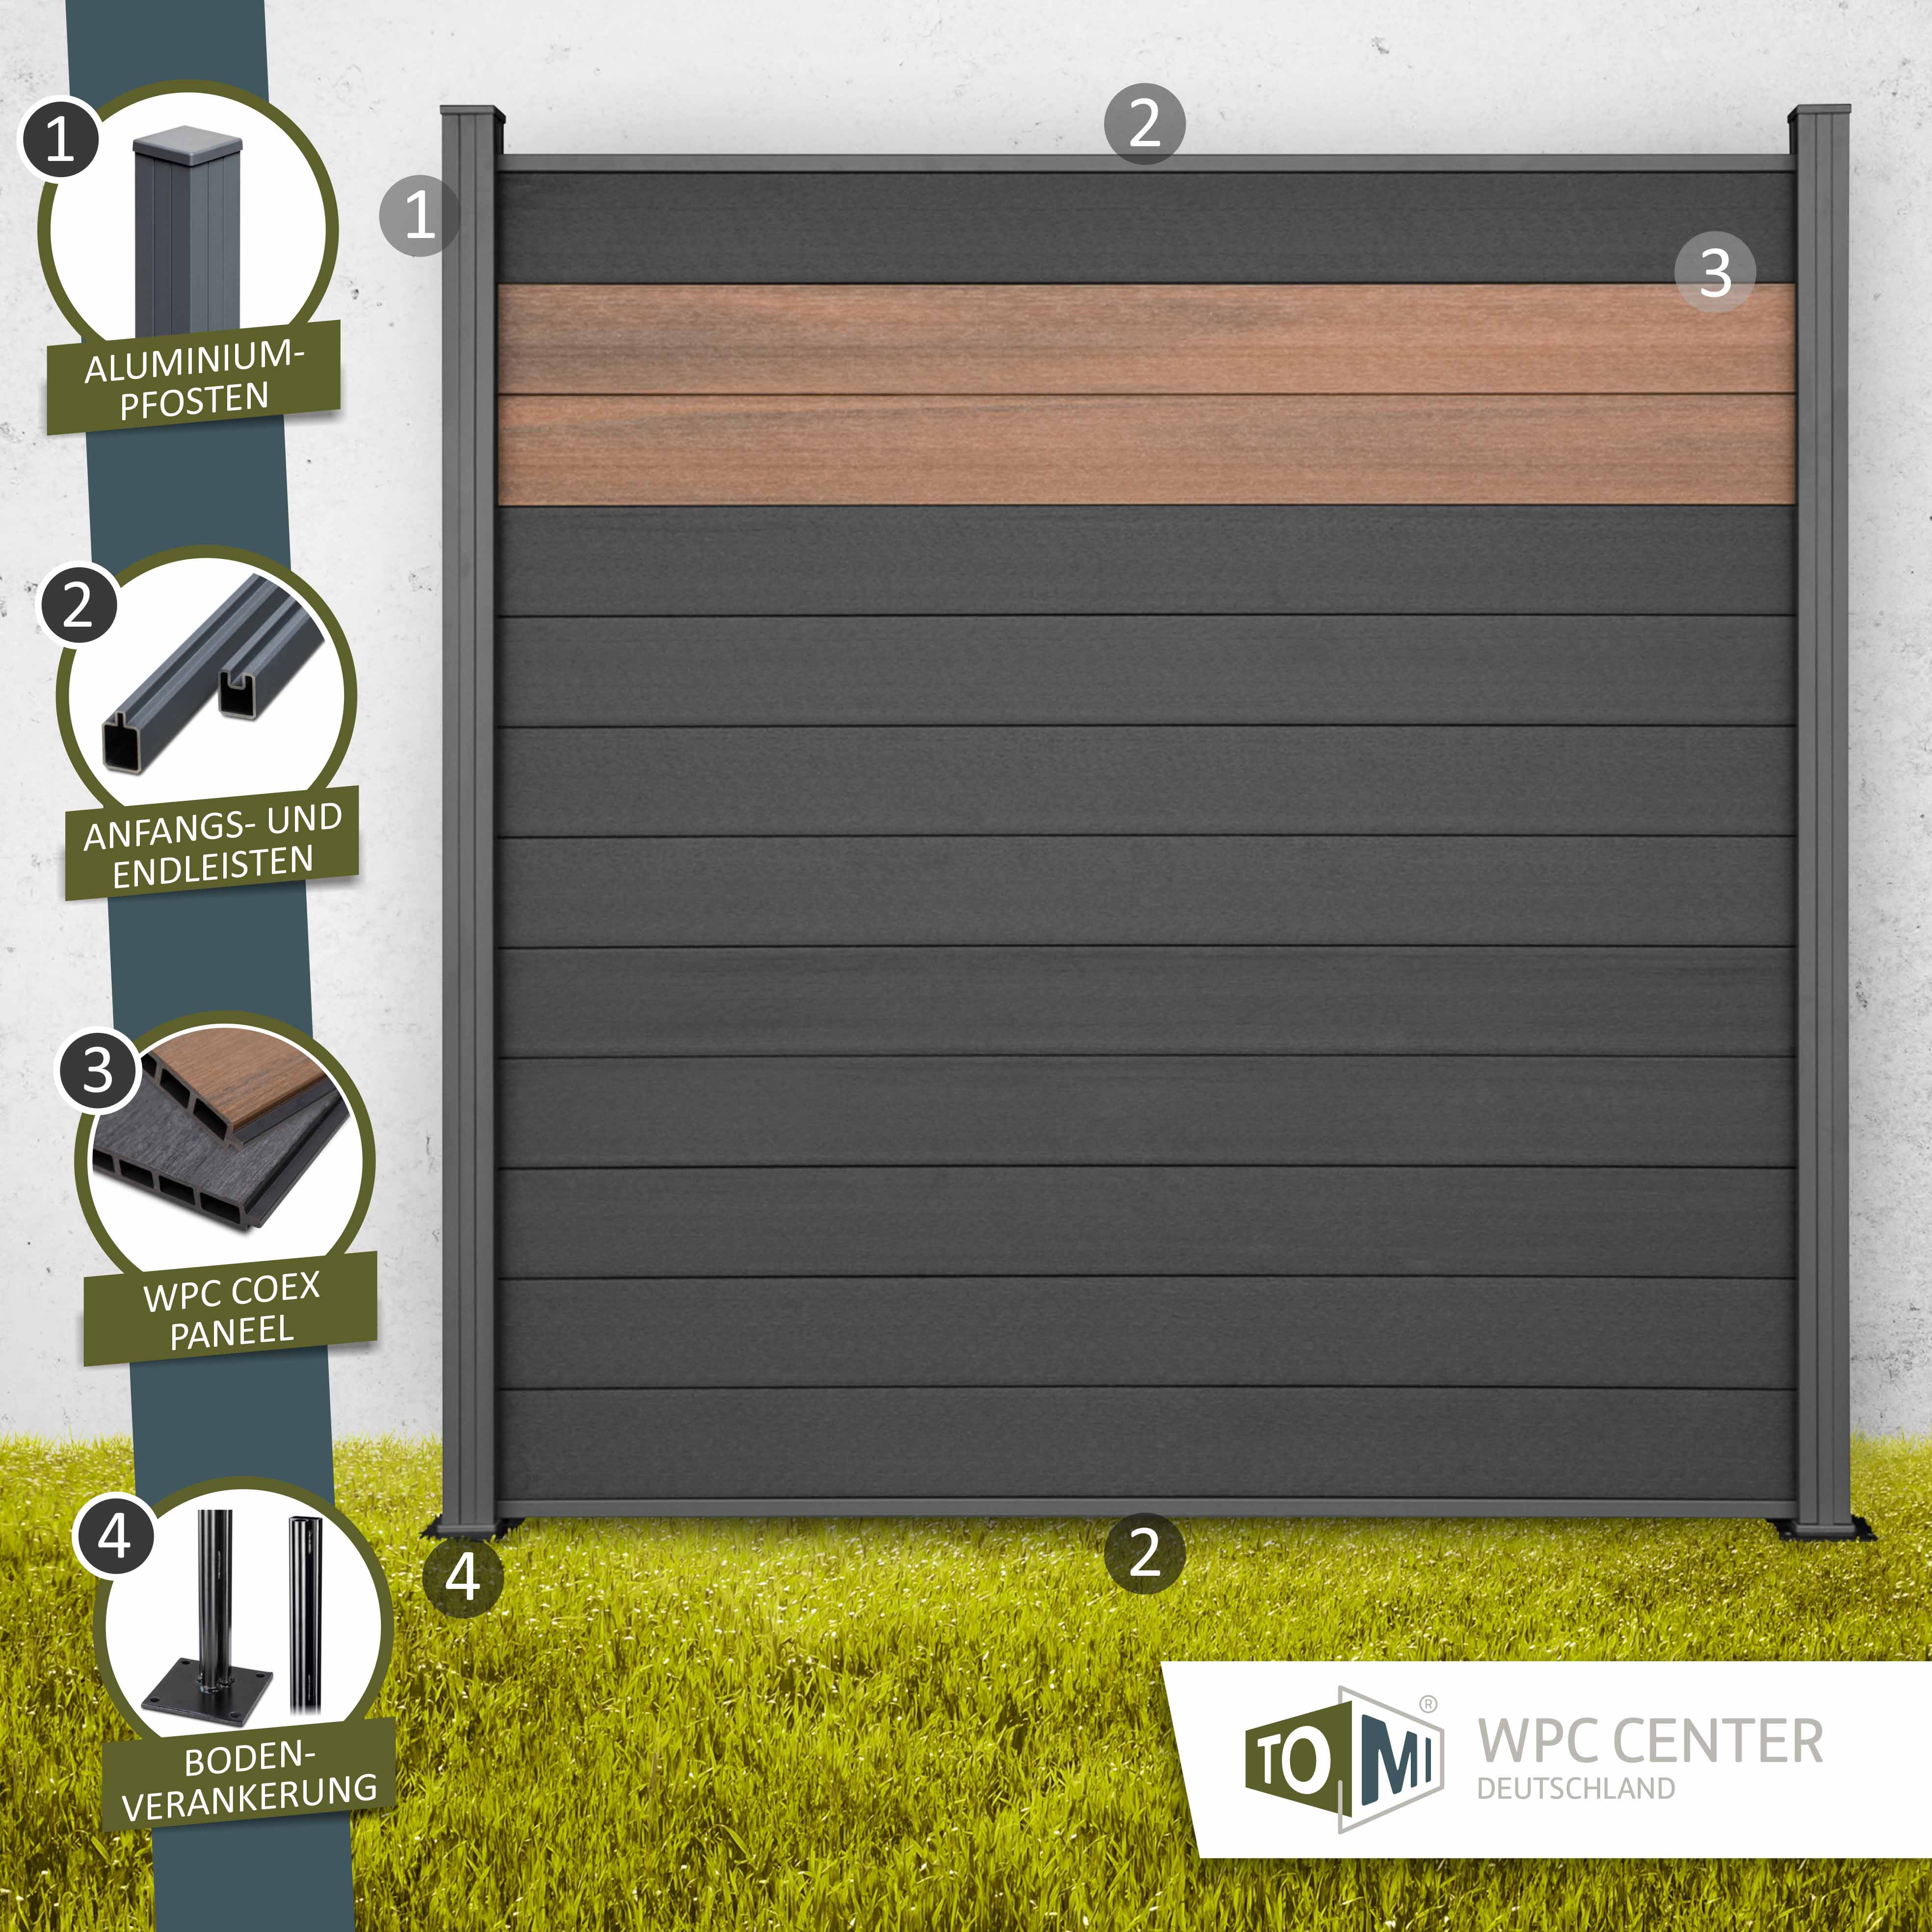 WPC COEX Premium Line BiColor Zaun Sichtschutzzaun Anthrazit Nussbraun